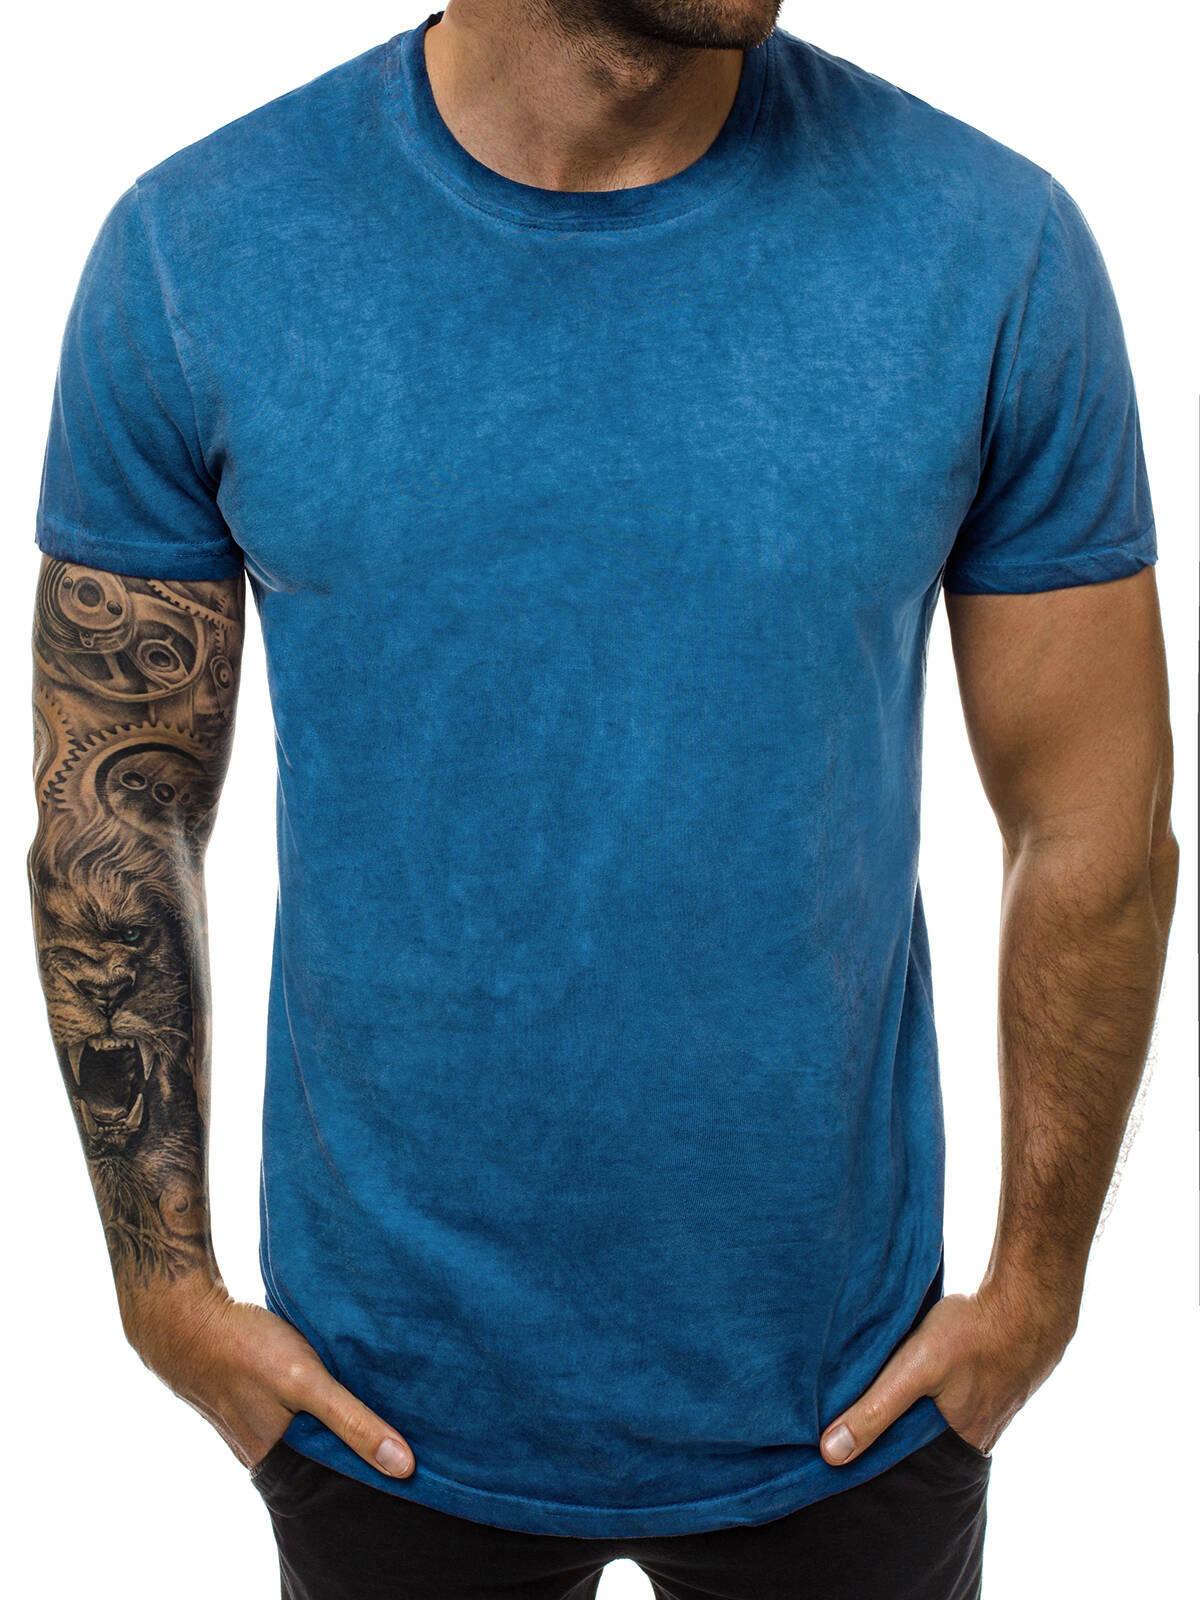 T-Shirt-Kurzarm-U-Neck-Slim-Fit-Fitness-Camo-Basic-Unifarben-Herren-OZONEE-MIX Indexbild 47